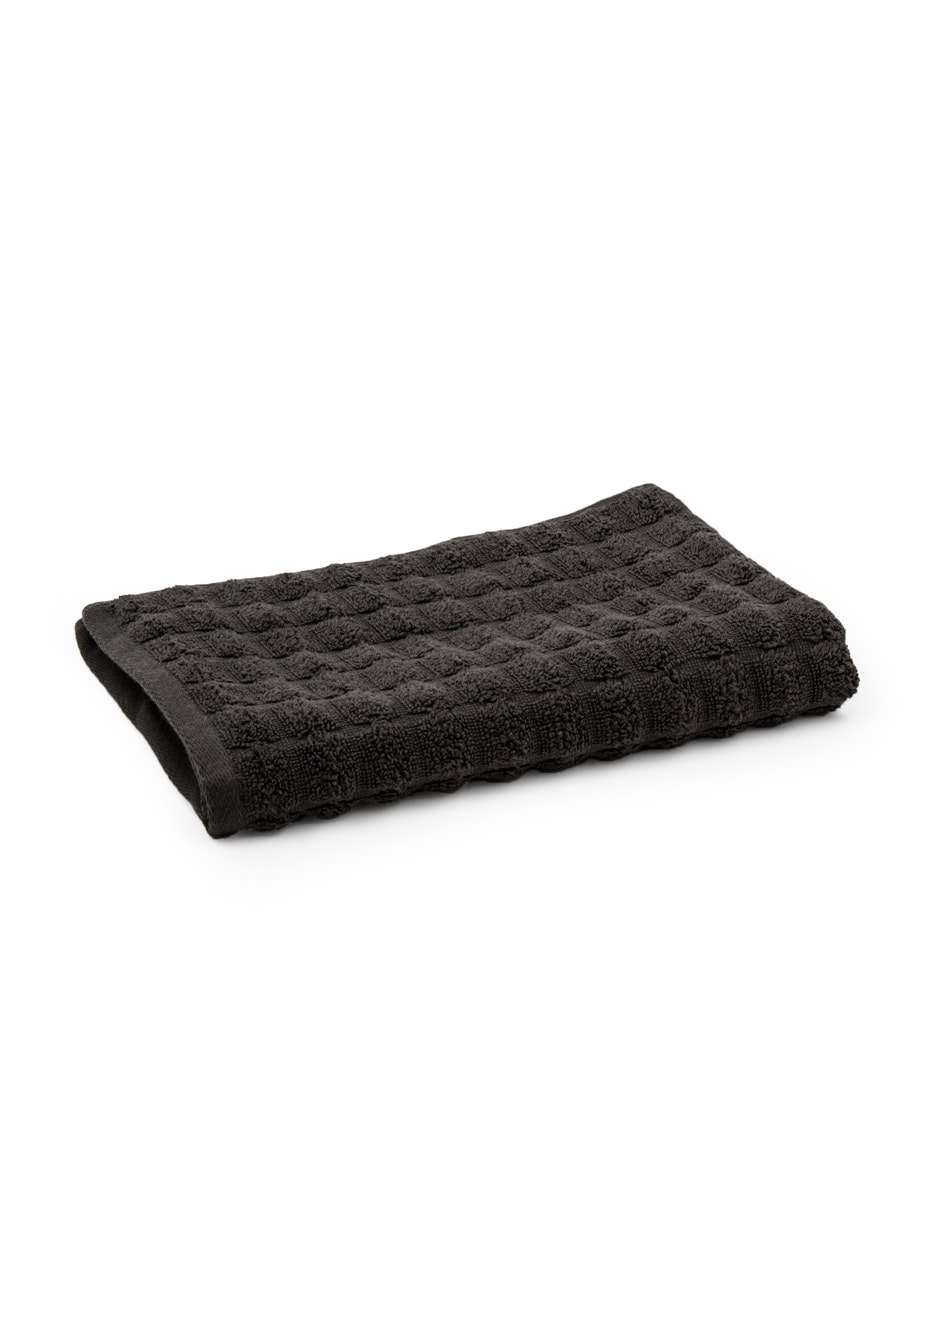 Conran Soho Hand Towel Charcoal